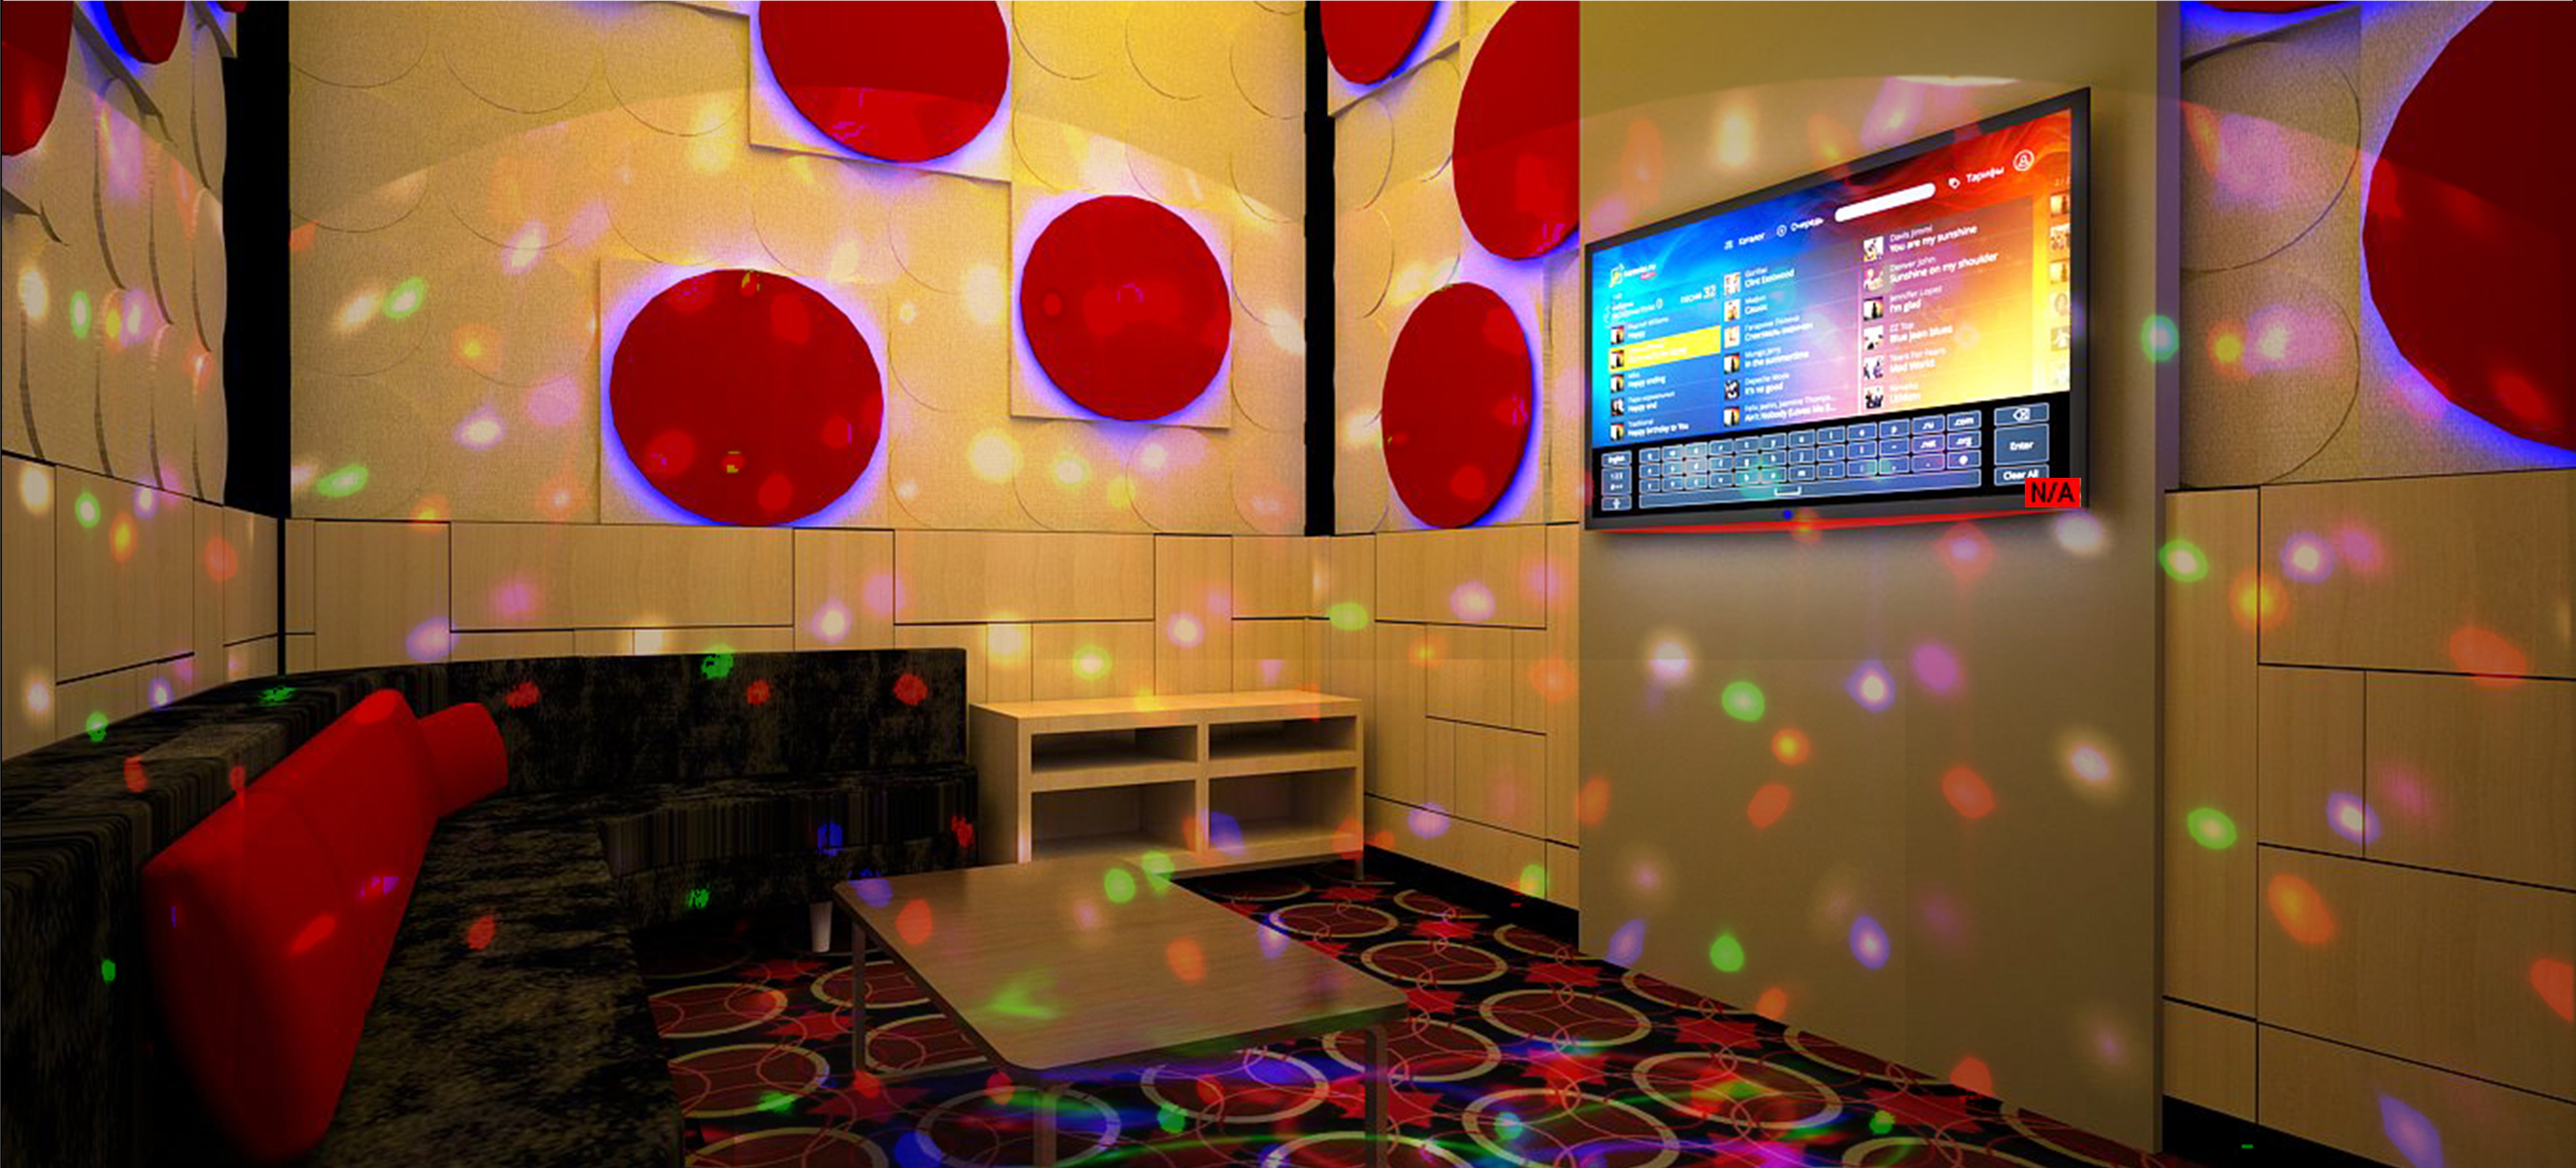 KTV Lounge